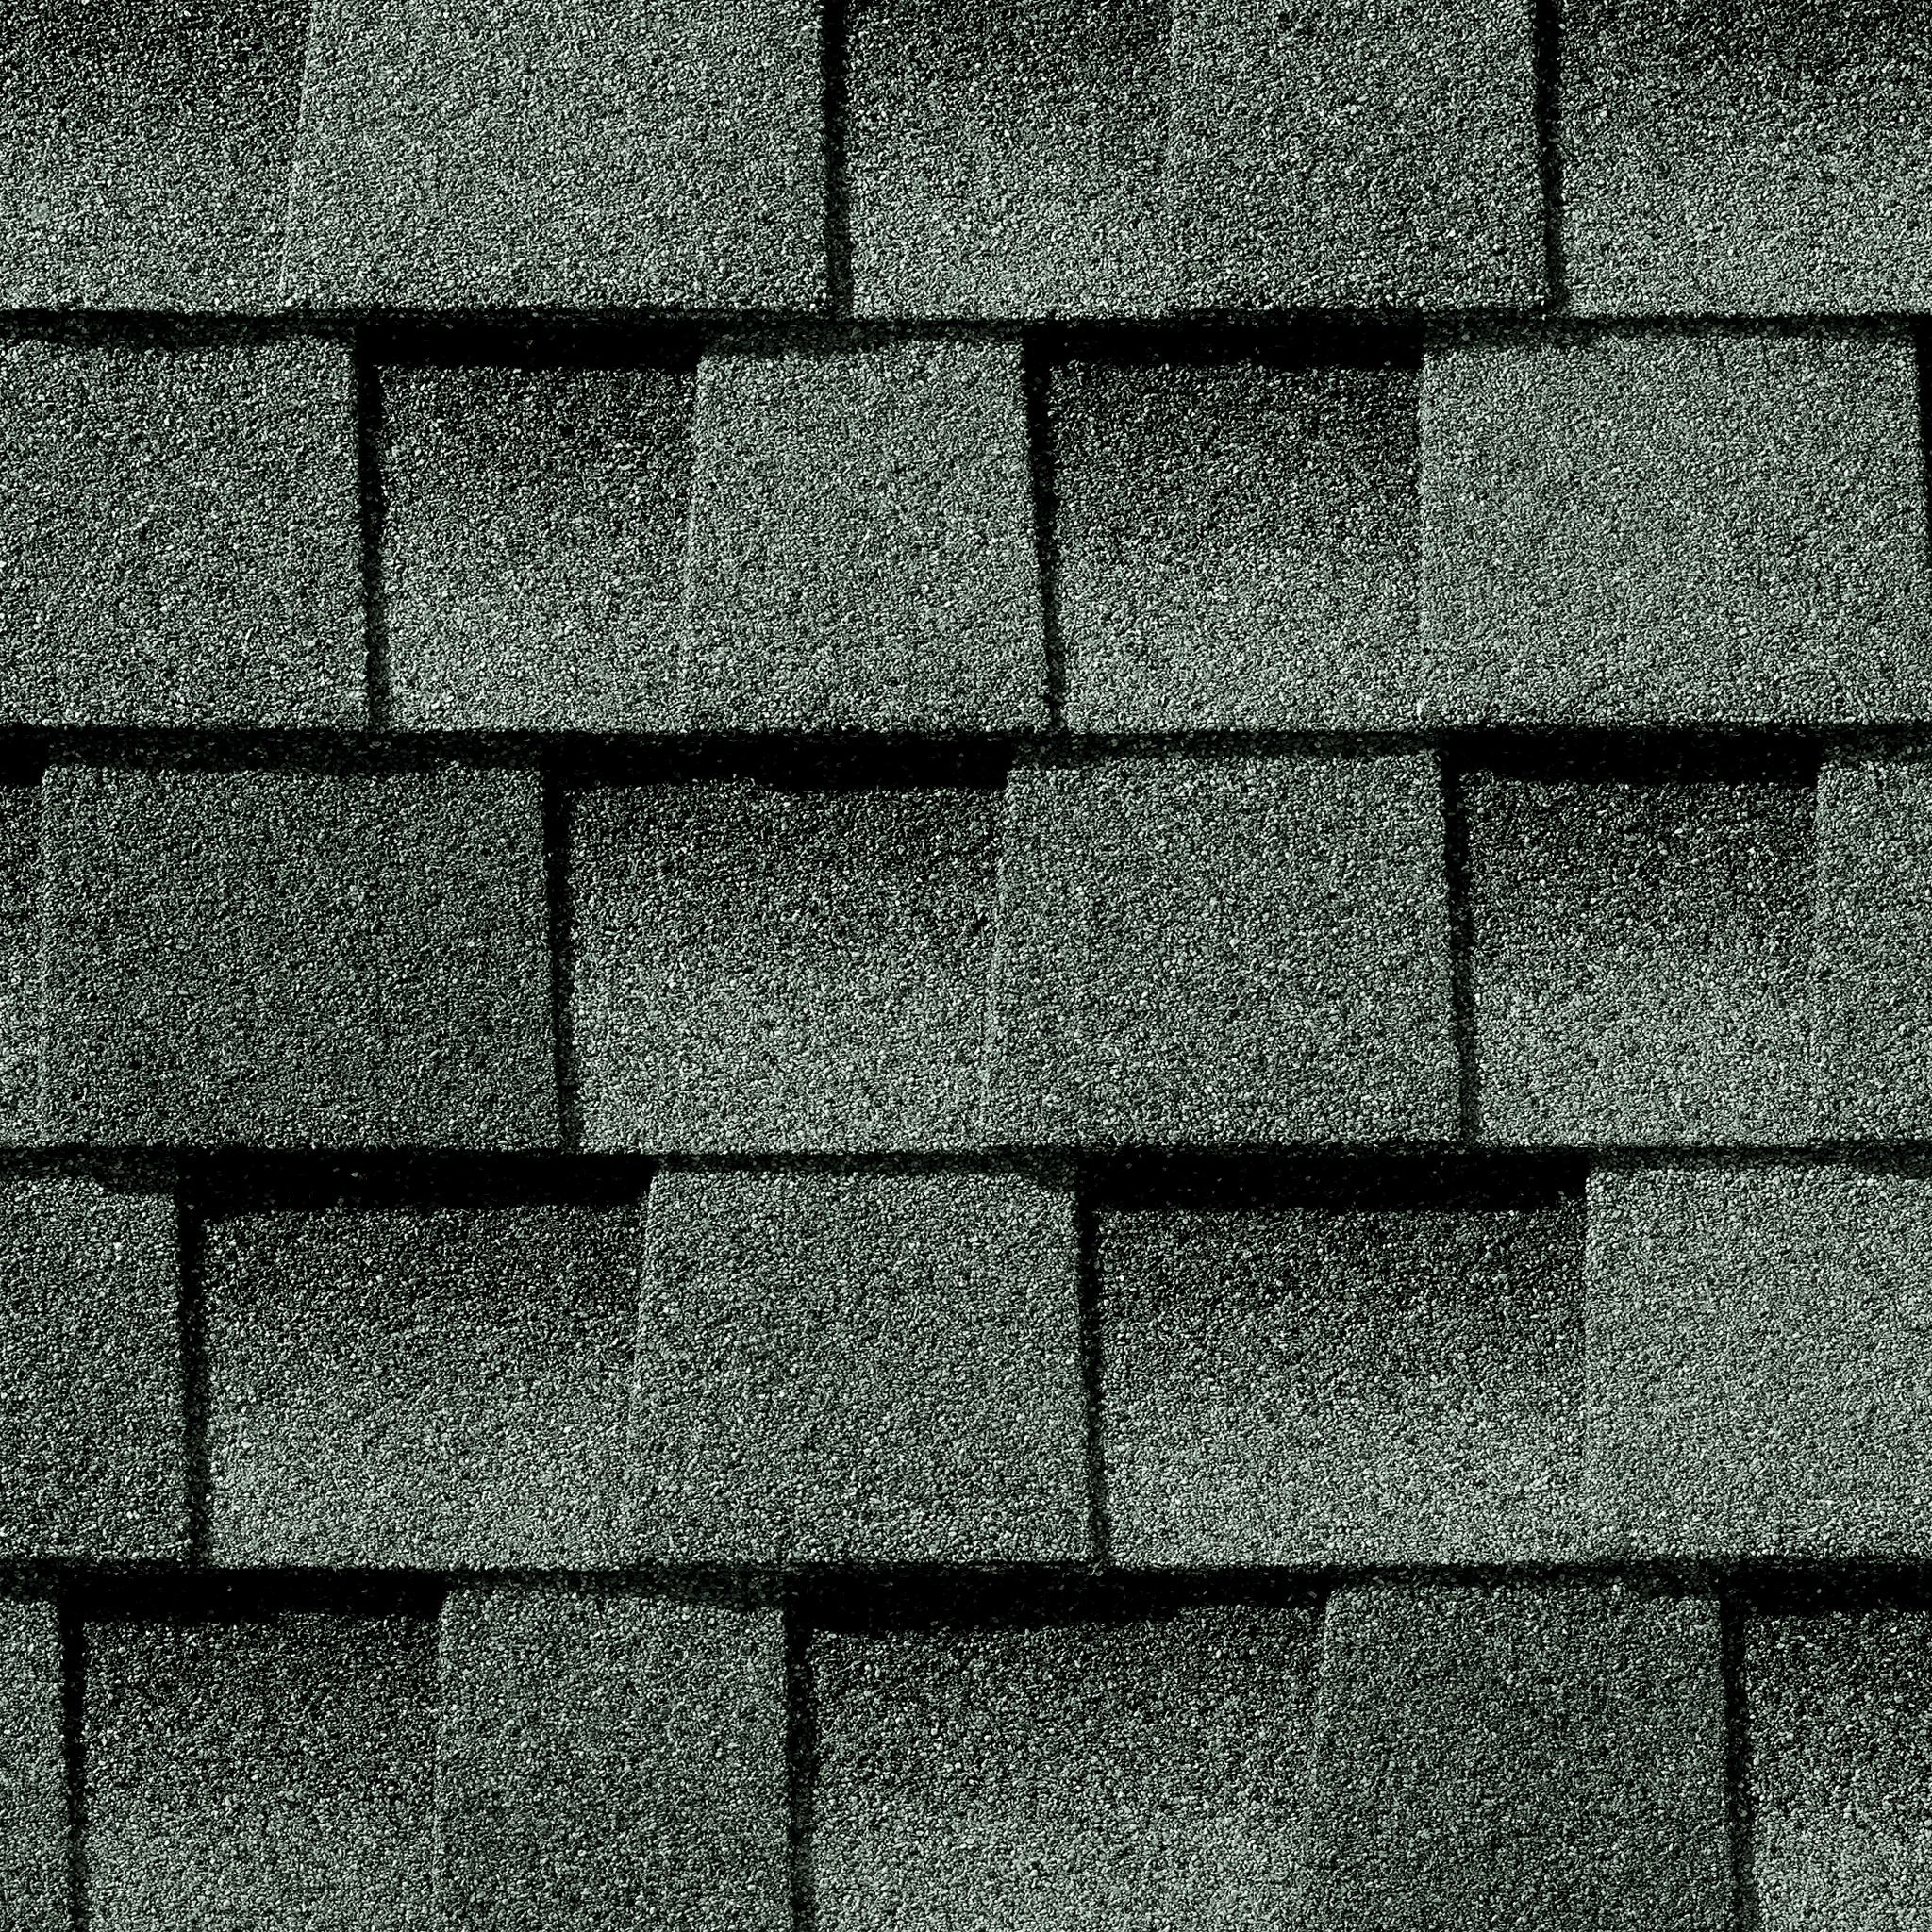 Close up photo of GAF's Timberline Ultra HD Slate shingle swatch